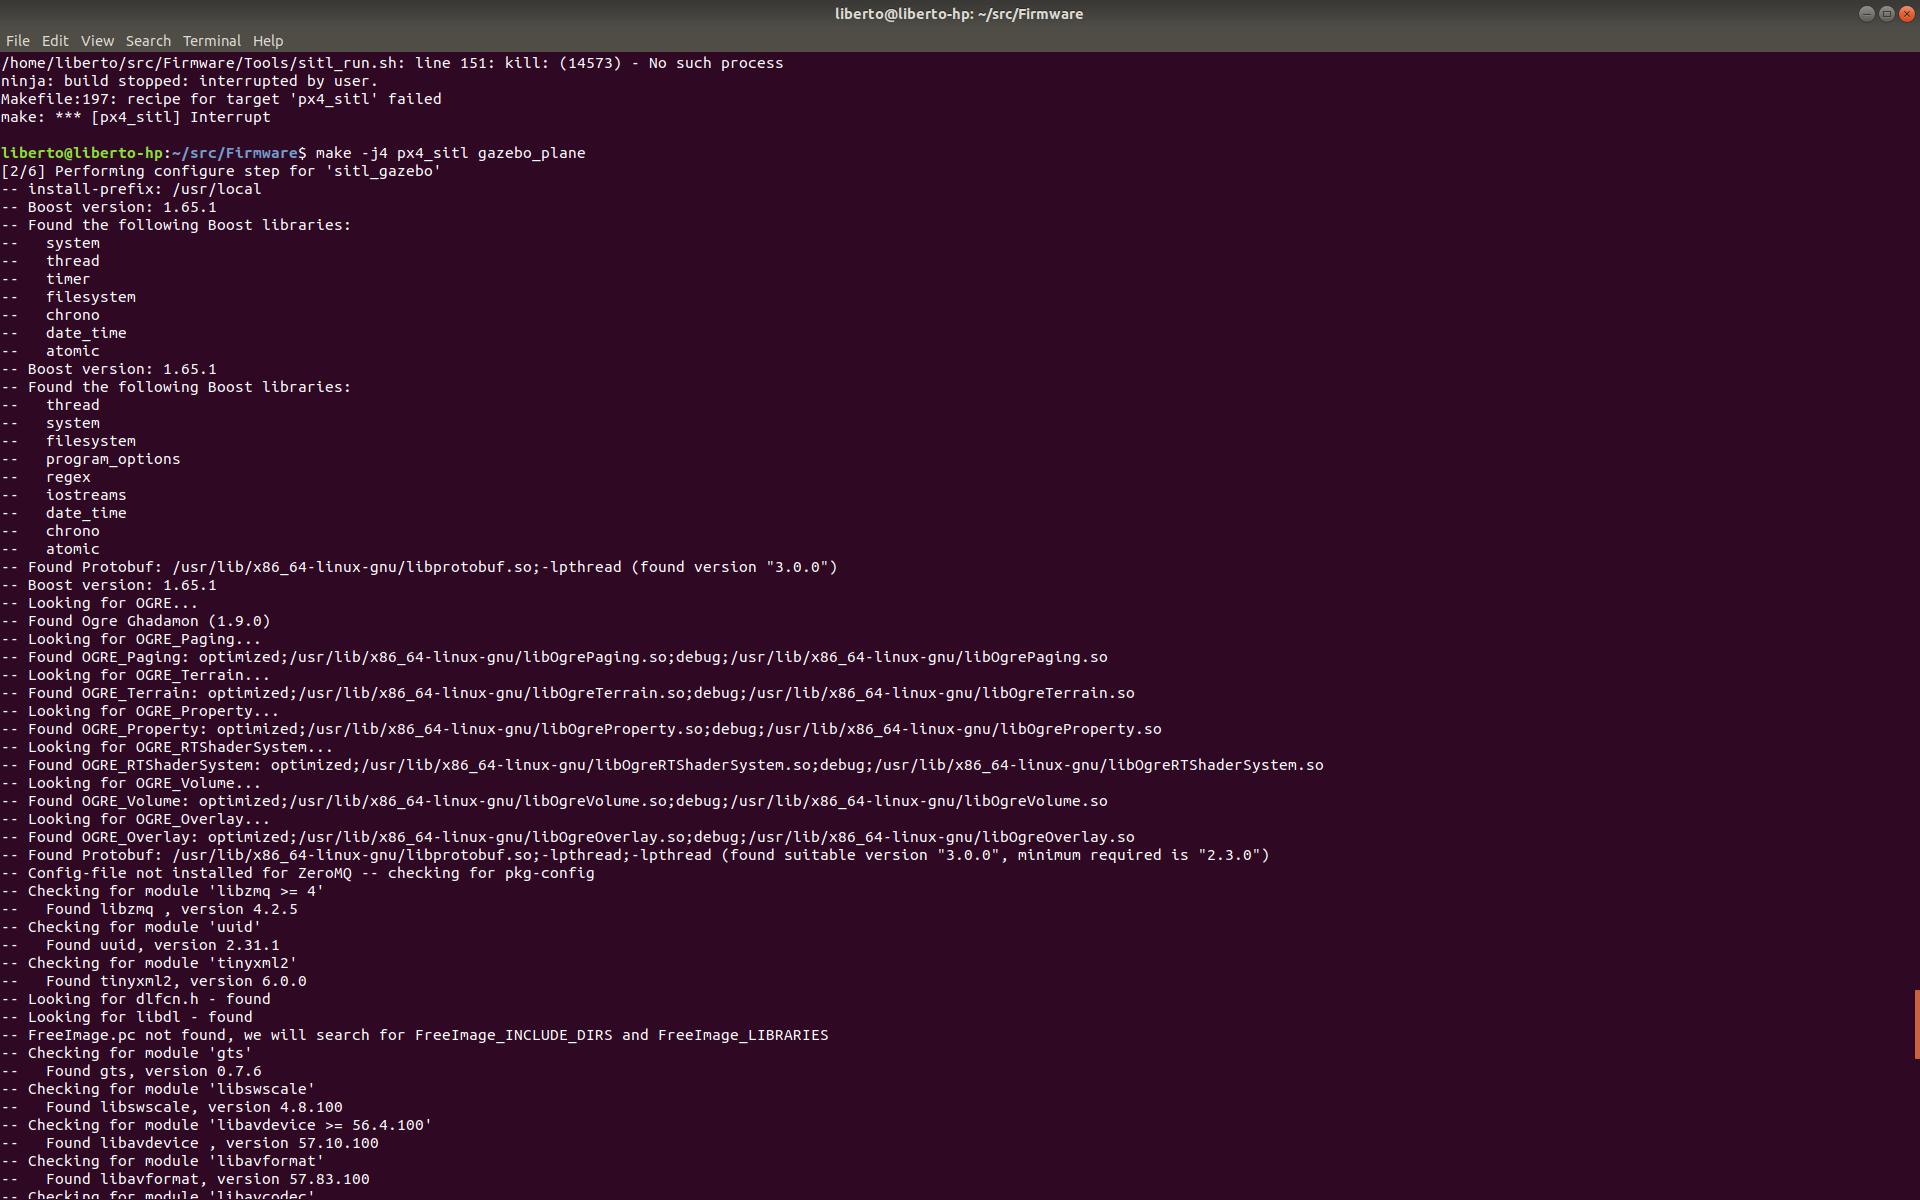 SITL, Model: plane, [Err] [gazebo_mavlink_interface cpp:1166] Error